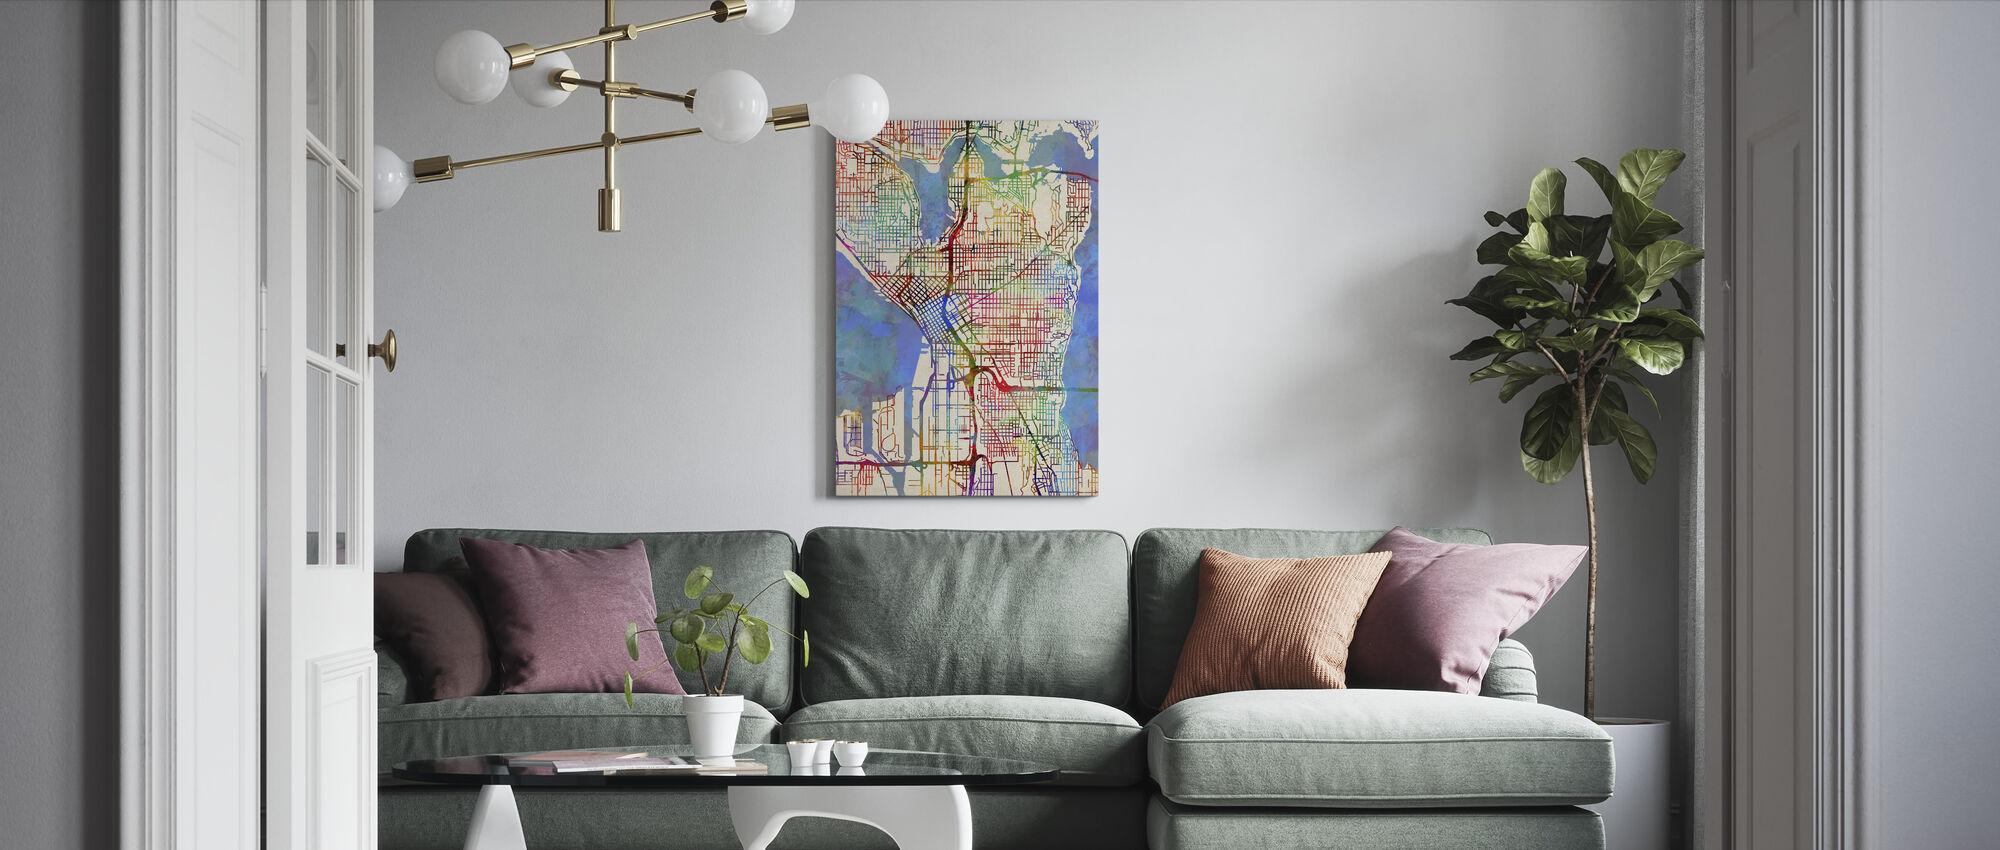 Seattle Washington Street Kaart - Canvas print - Woonkamer